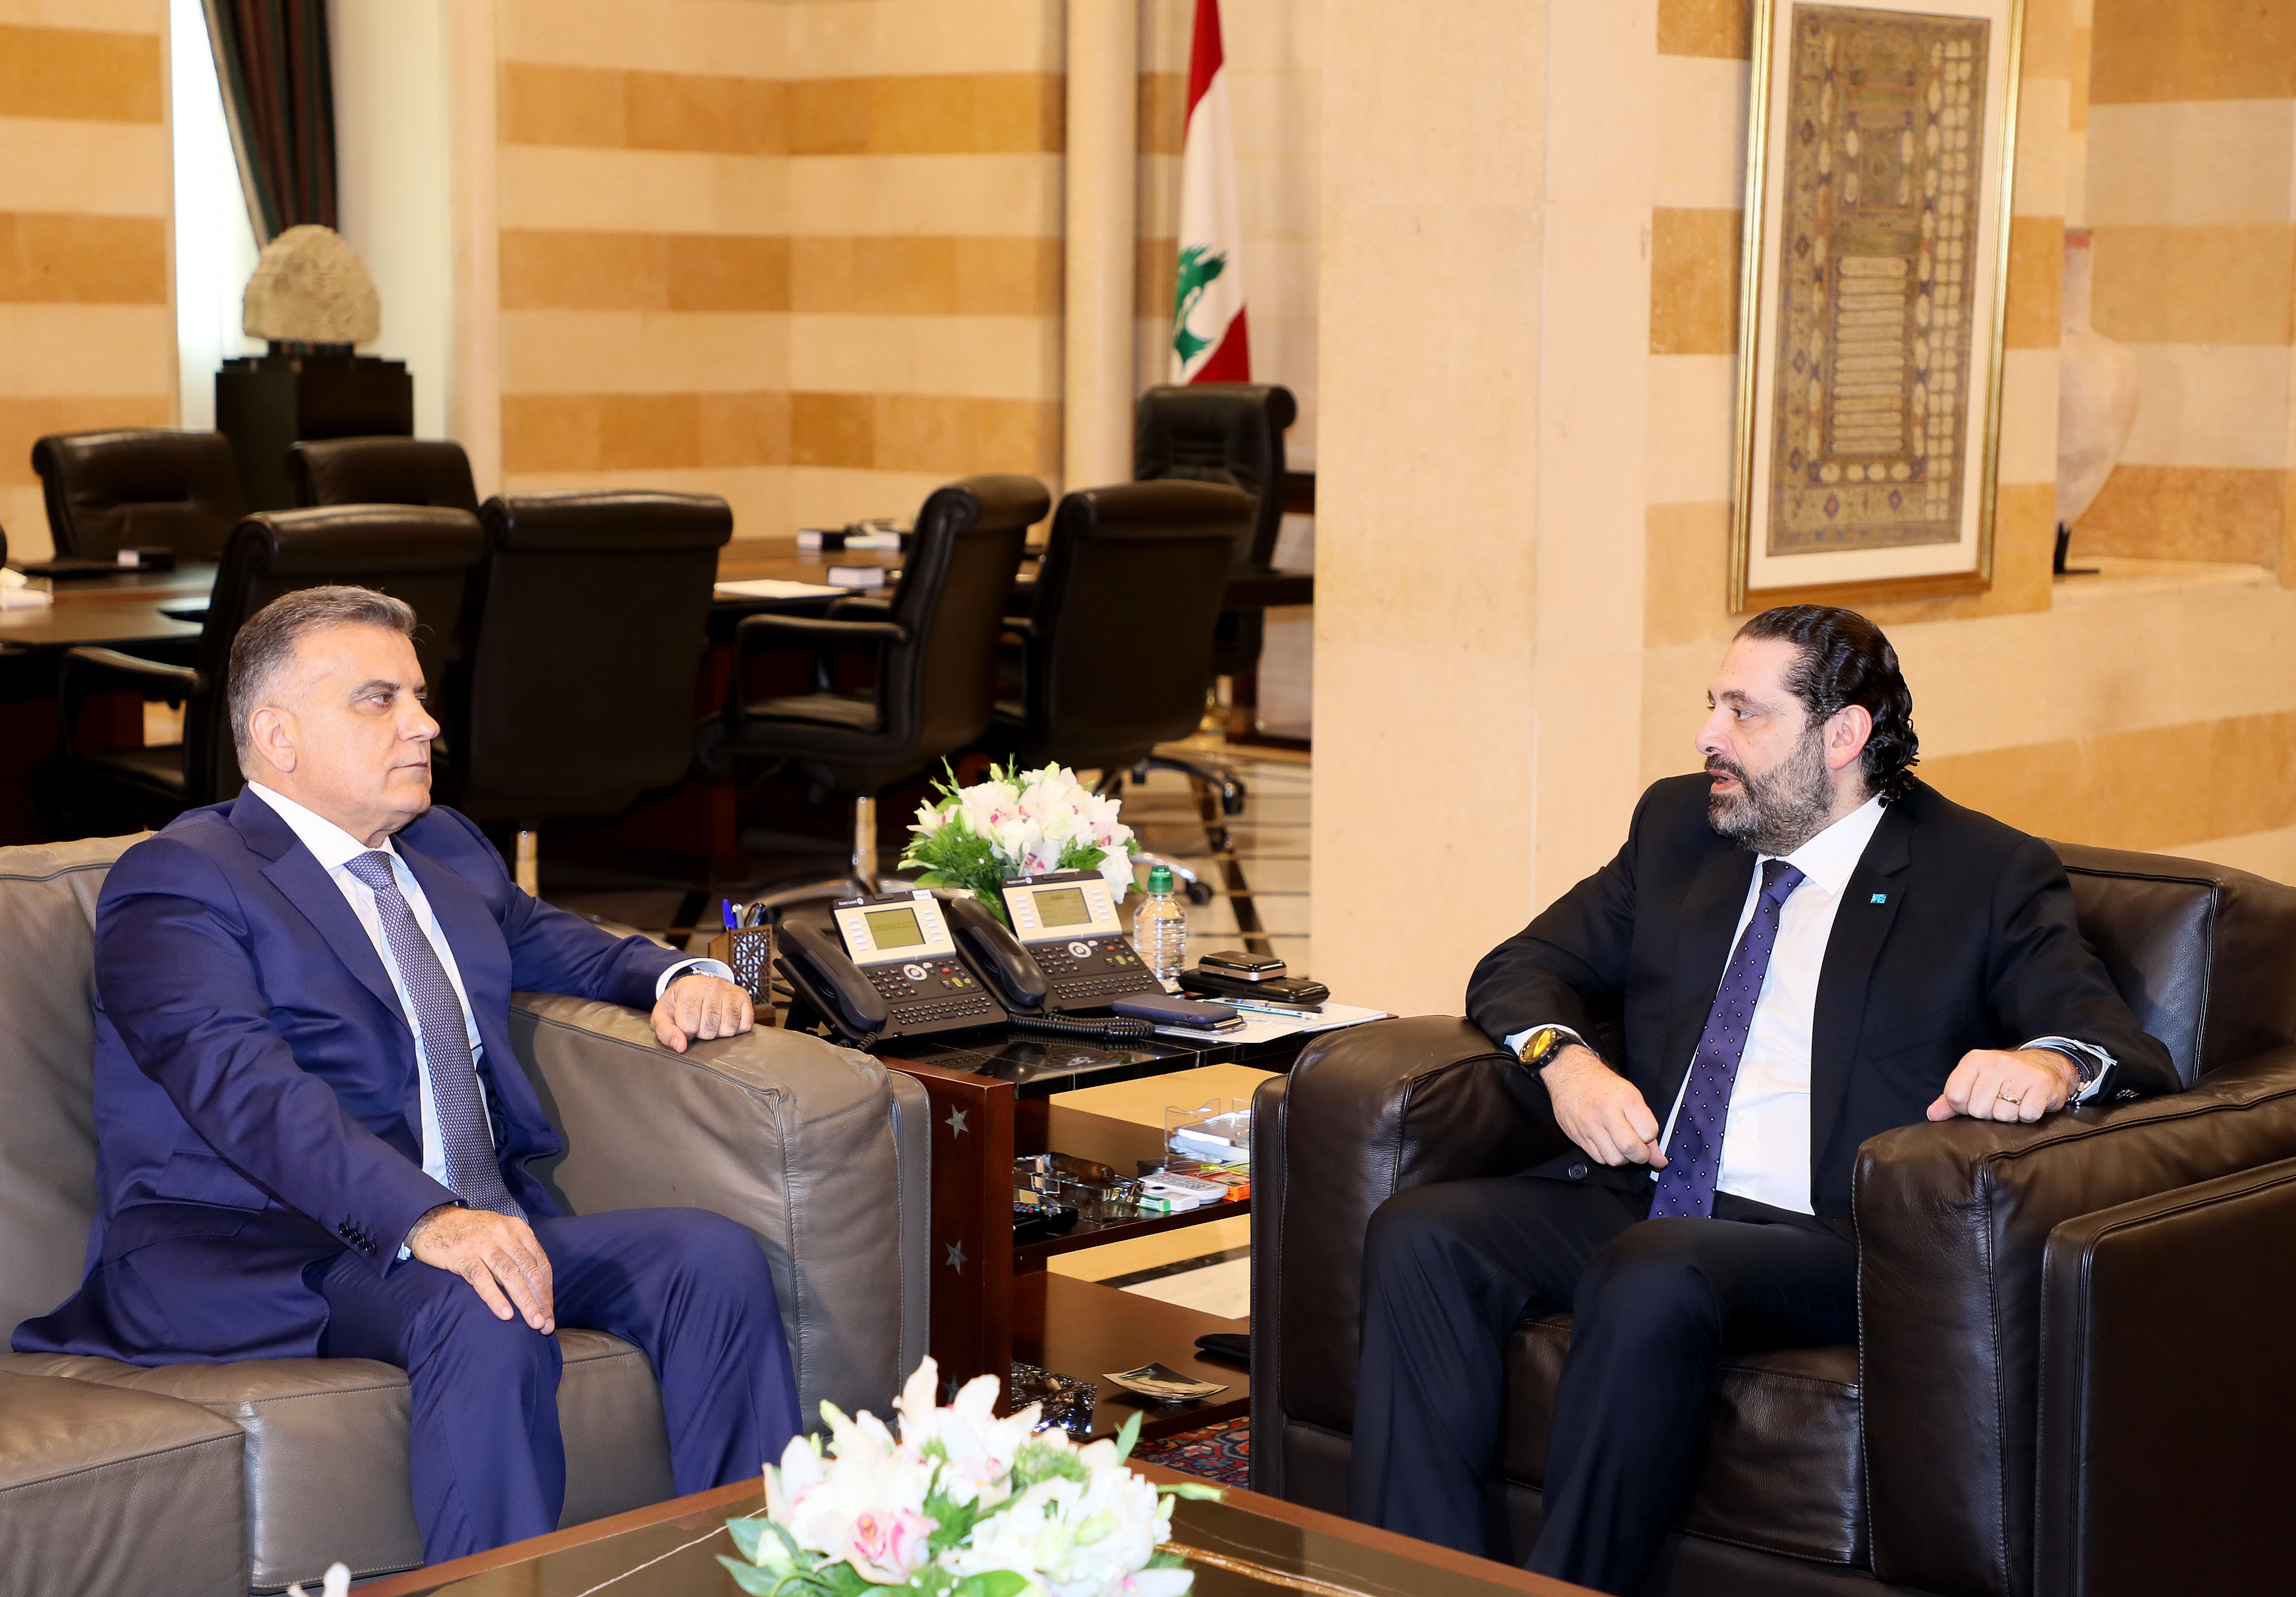 Pr Minister Saad Hariri meets General Abbas Ibrahim